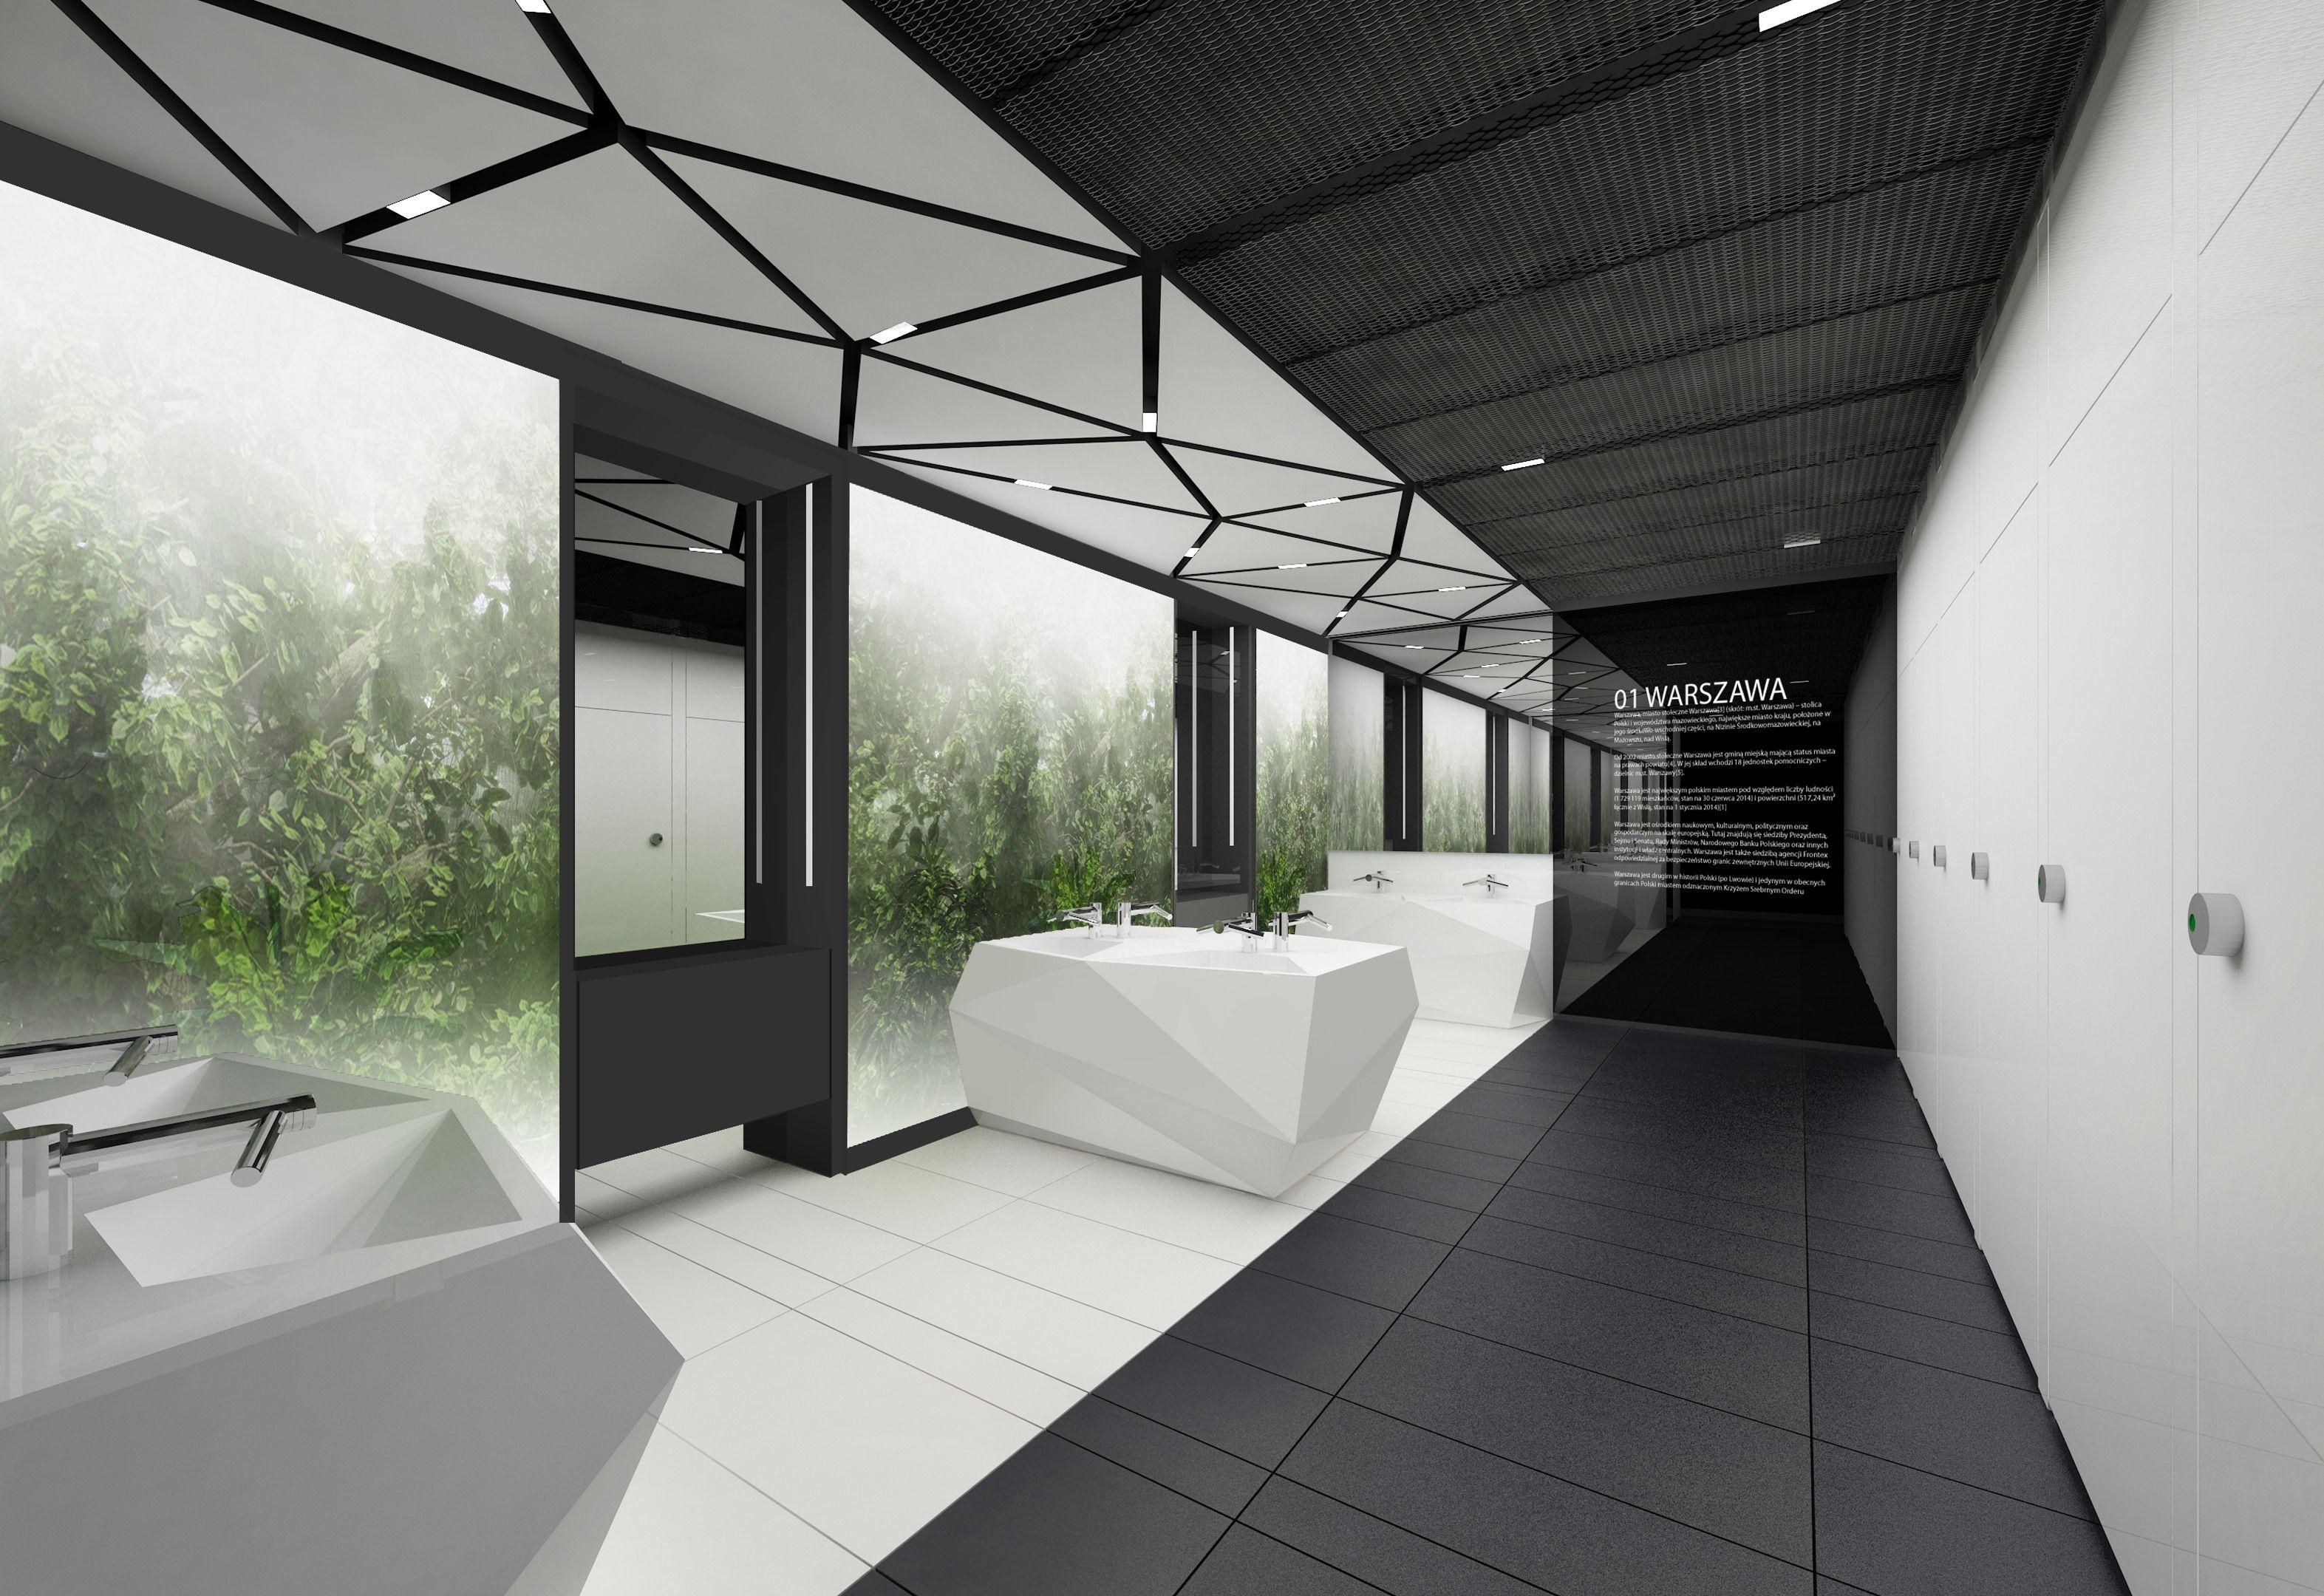 Design of the interior for public toilets and corridors in SC Złote